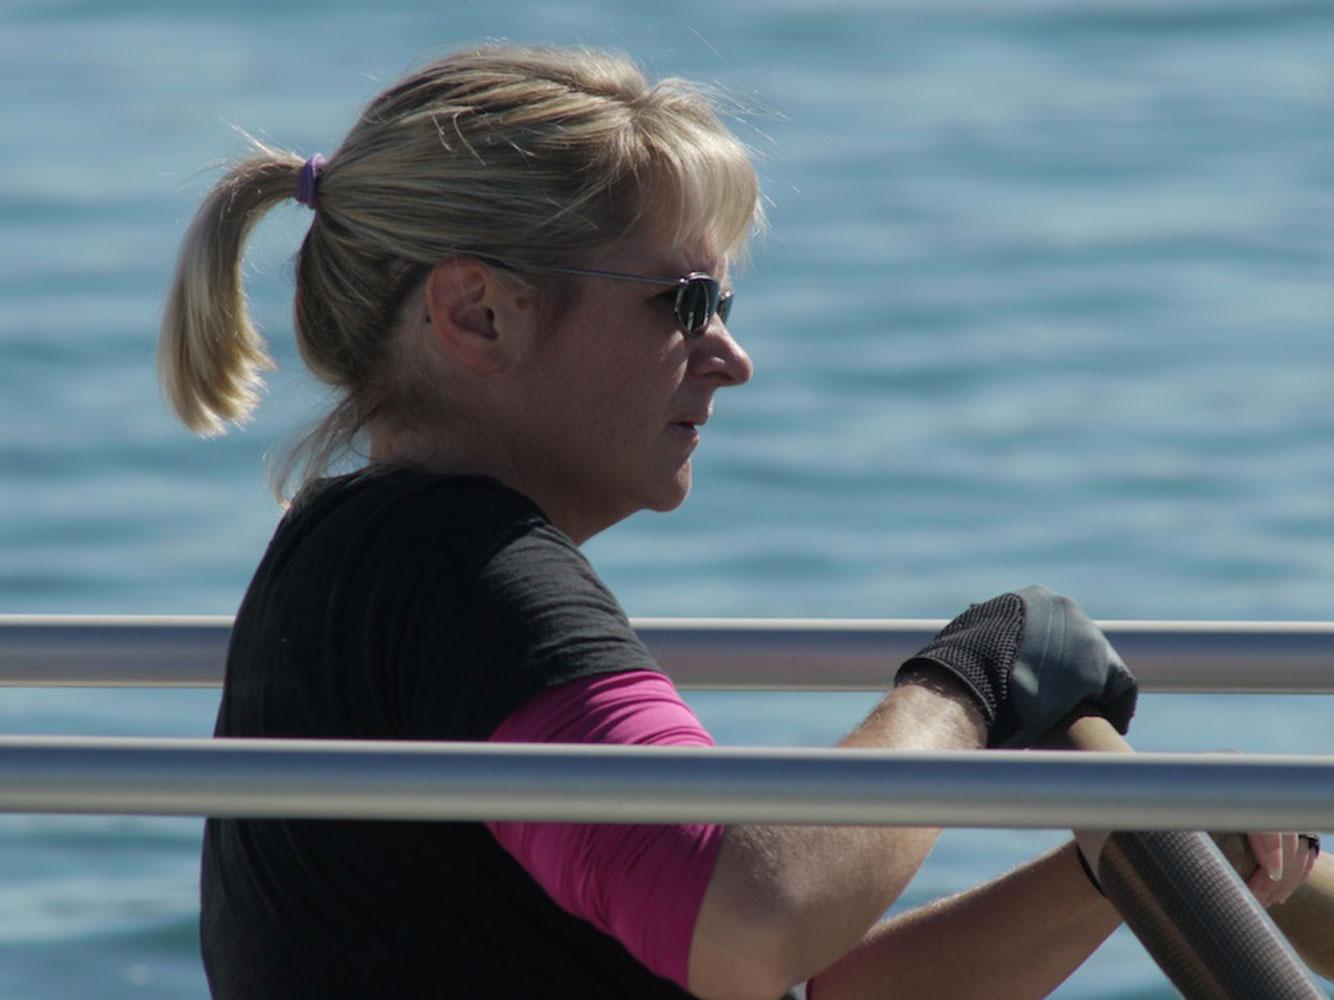 Bird advocate rows Southern California coast to spread awareness